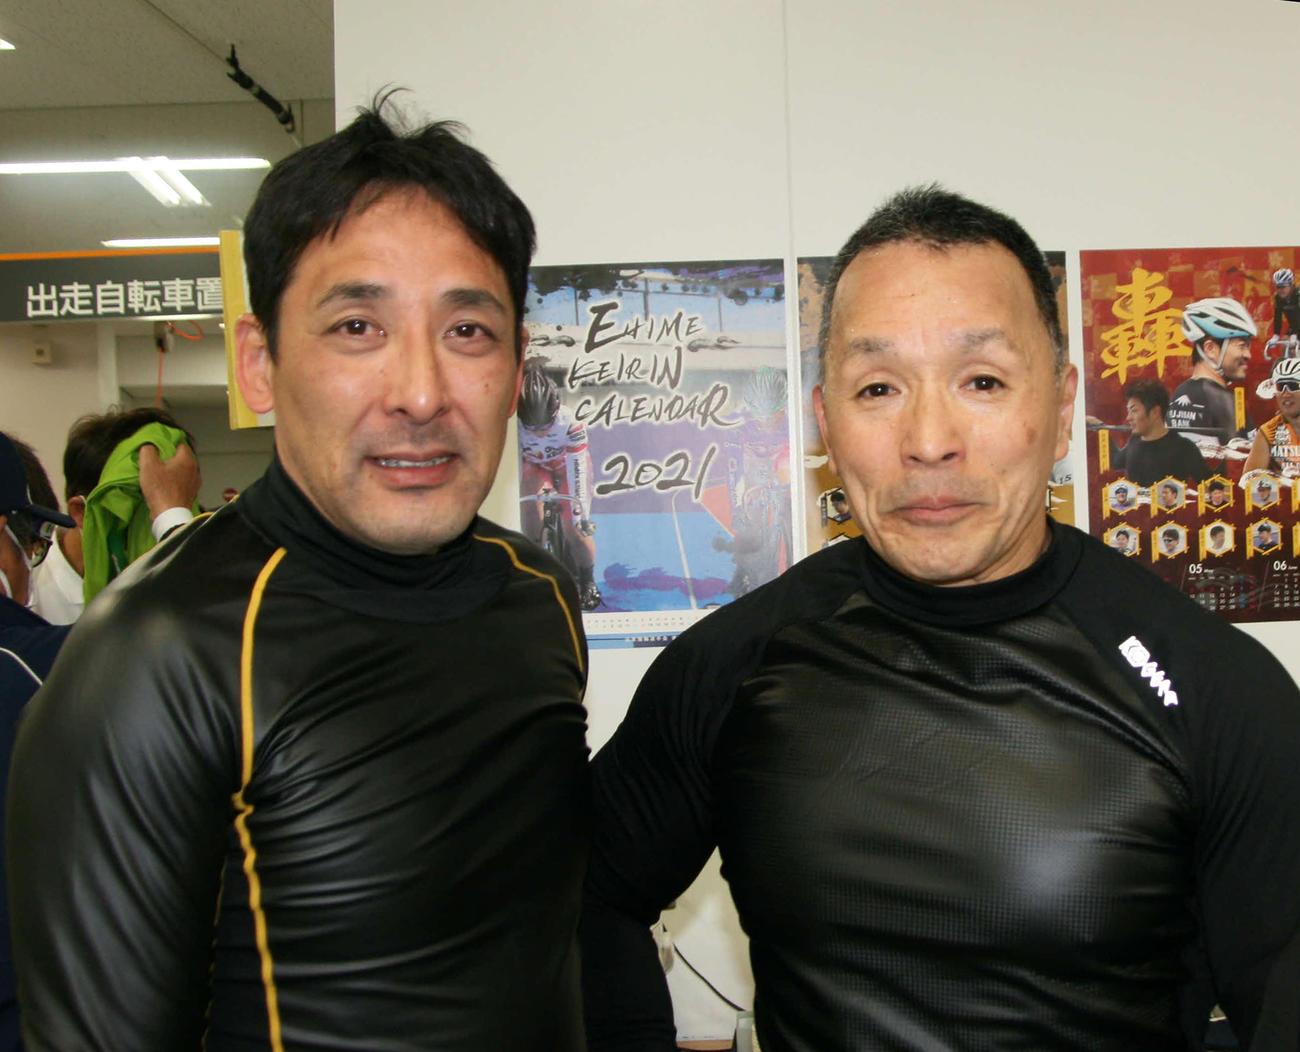 1Rは柳沢達也(左)と中武克雄で足して105歳のベテランコンビがワンツーフィニッシュ(撮影・秋山正則)